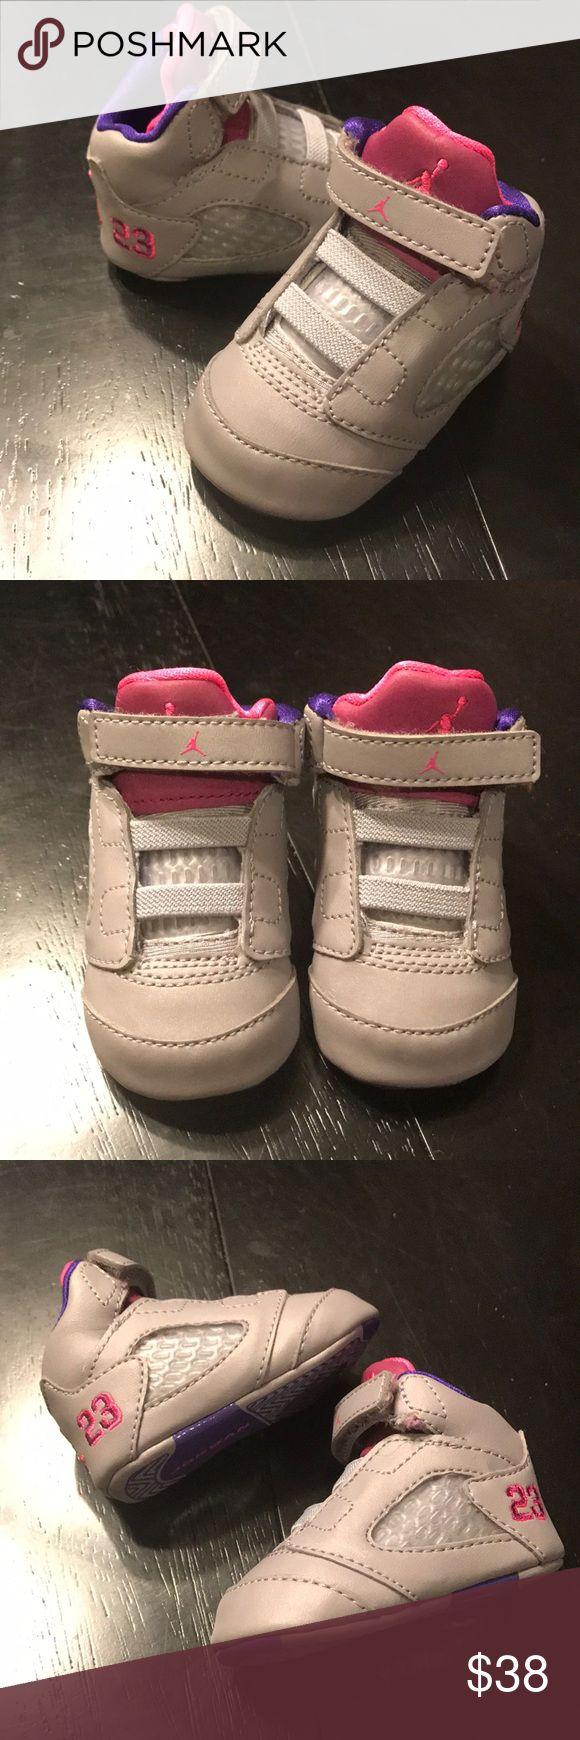 Best 25 Baby Jordan Shoes Ideas On Pinterest Baby